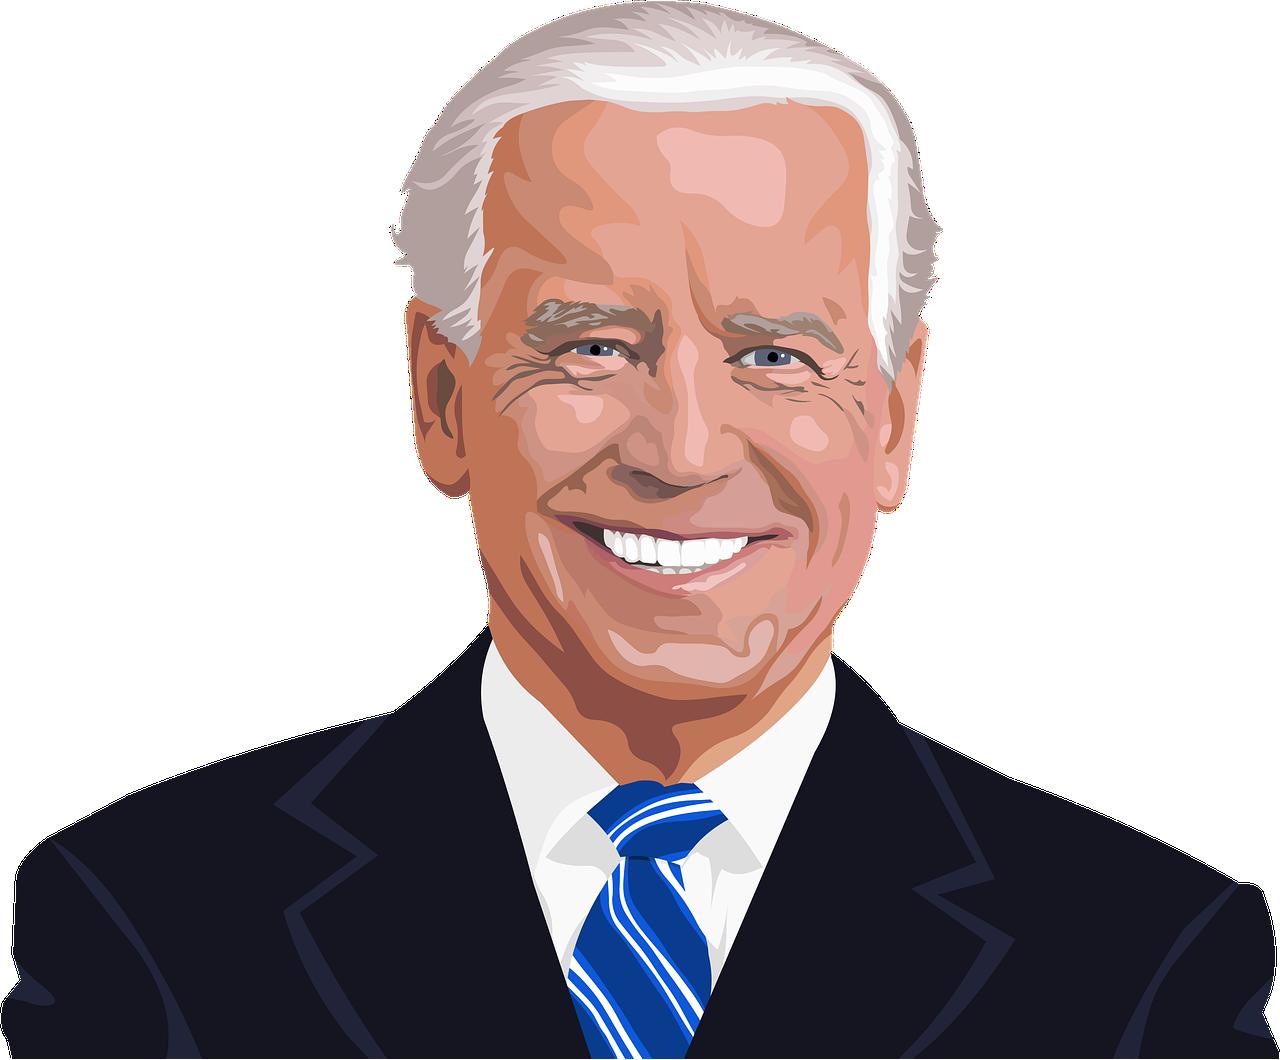 Smile Politician Man Adult Male  - heblo / Pixabay